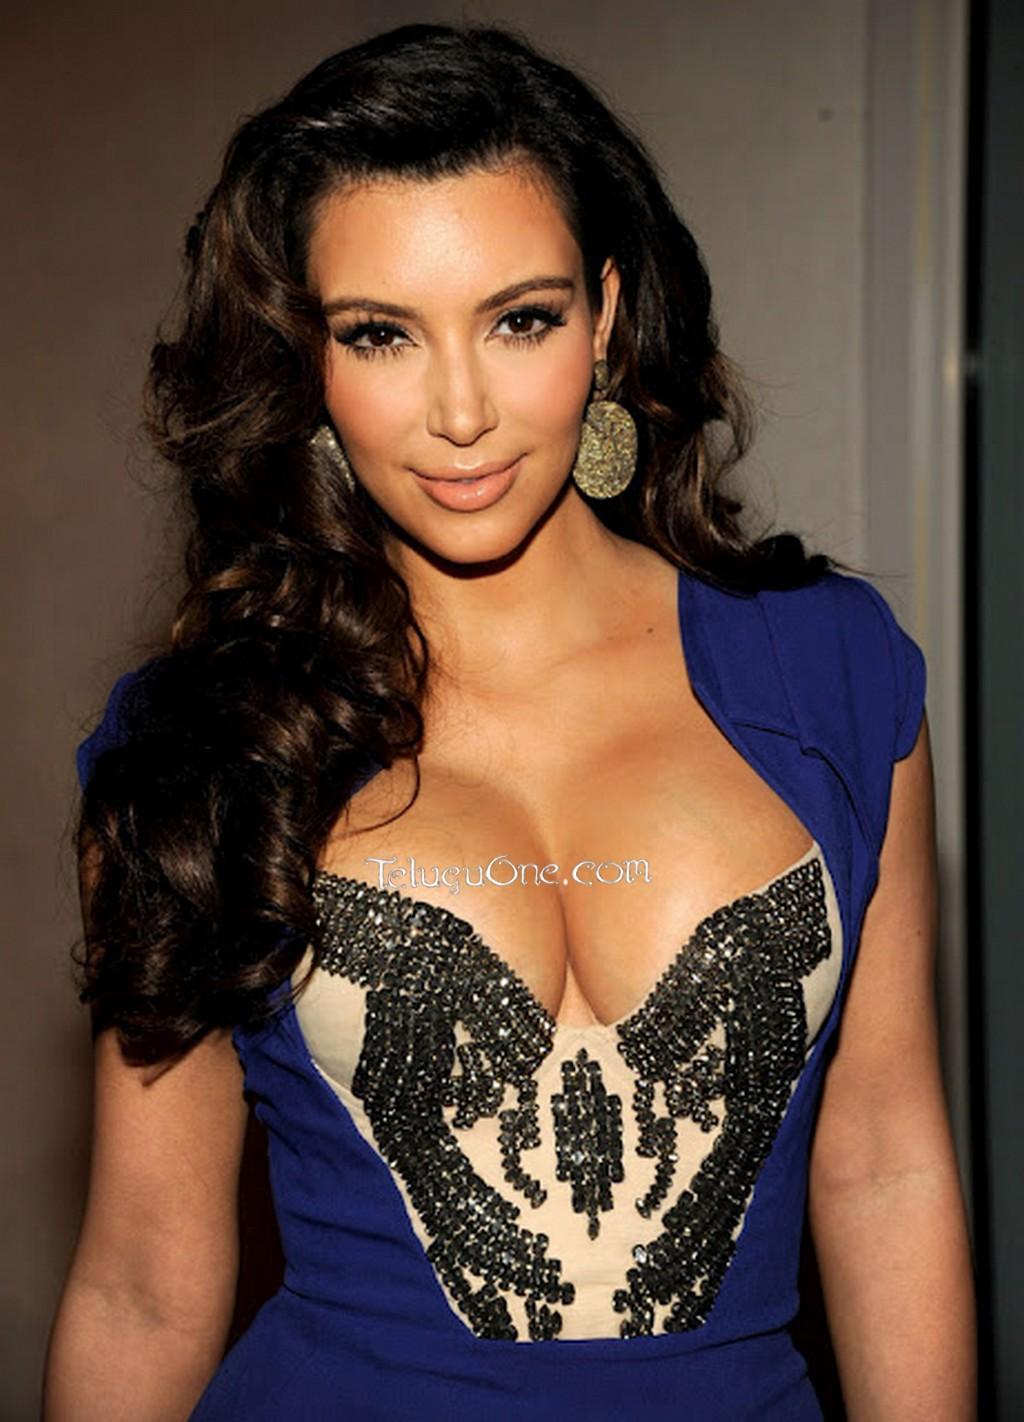 http://4.bp.blogspot.com/-lyUCJlalozk/USTIW_fLROI/AAAAAAAAHFc/BxEBsbahf78/s1600/Kim_Kardashian_Hot_Photos1.jpg